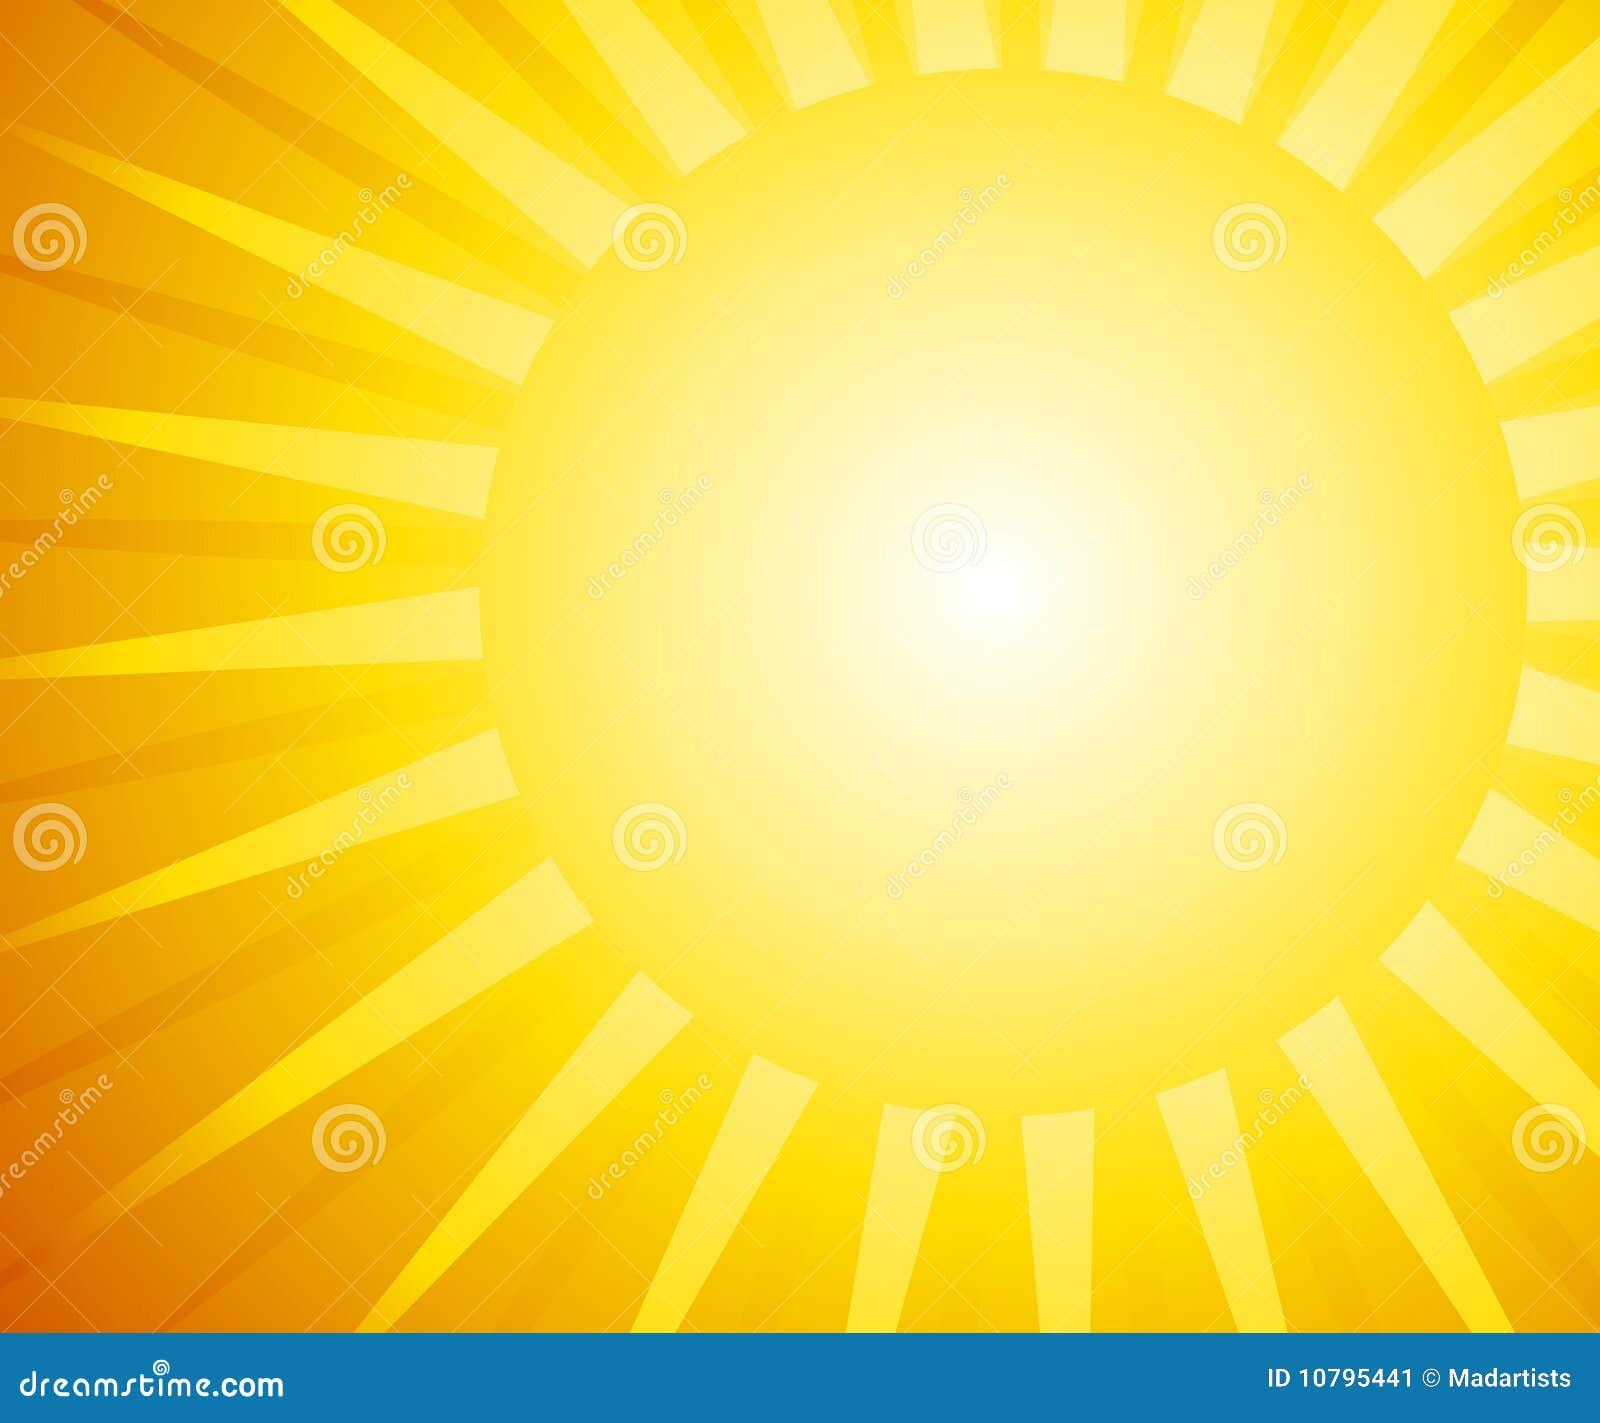 sunshine background stock image image 10795441 clip art clowns free clip art crown free